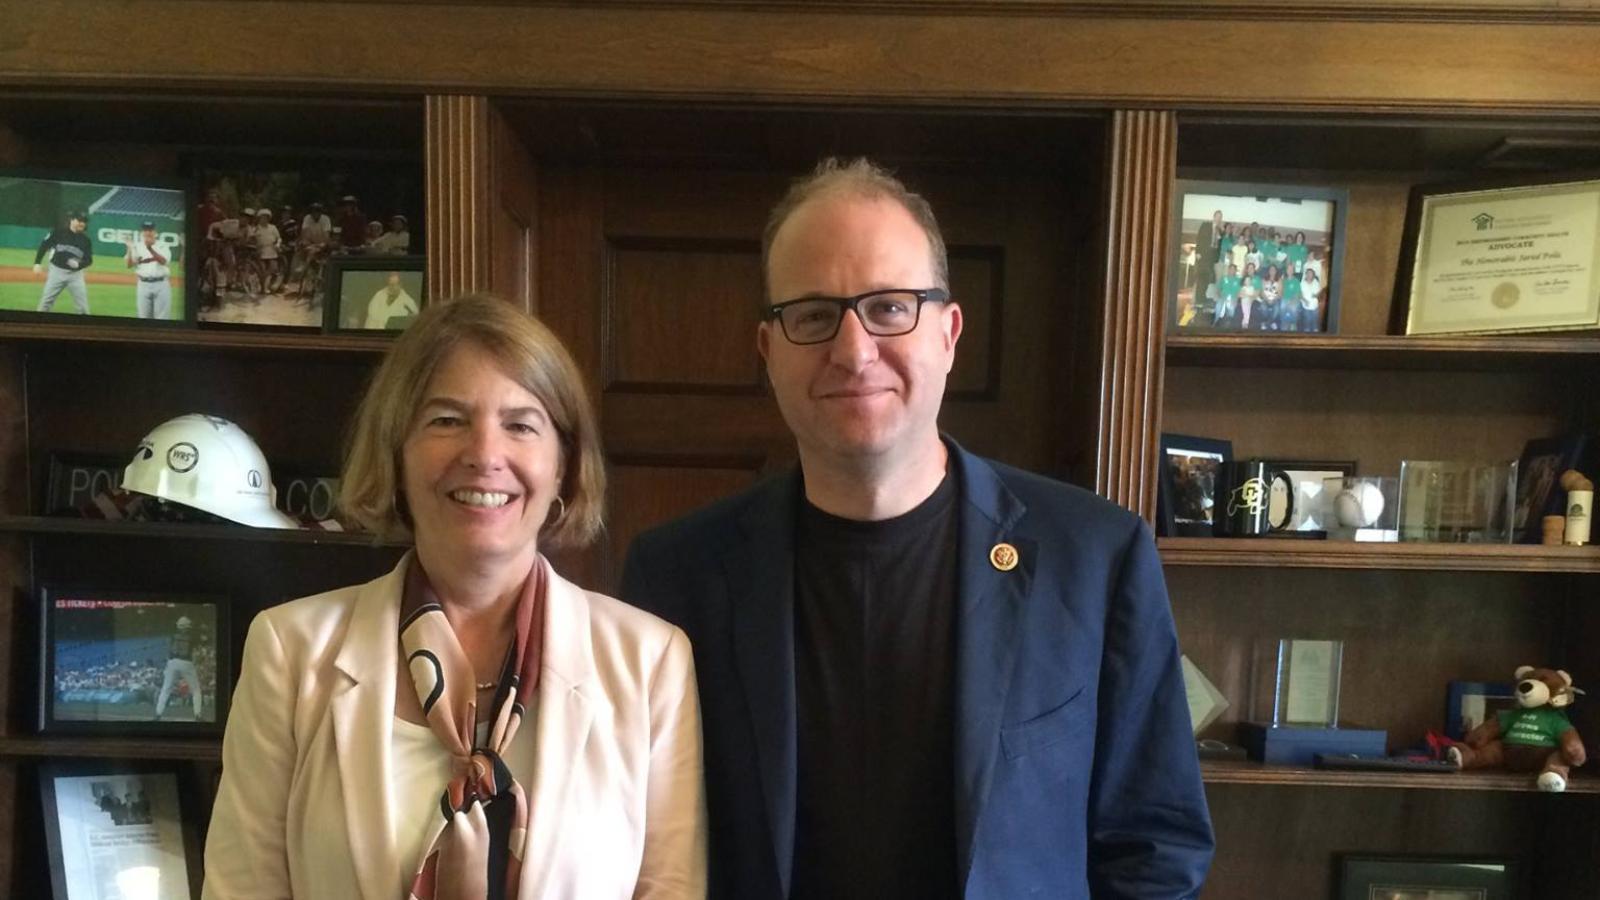 Dr. Banich with Congressman Jared Polis.